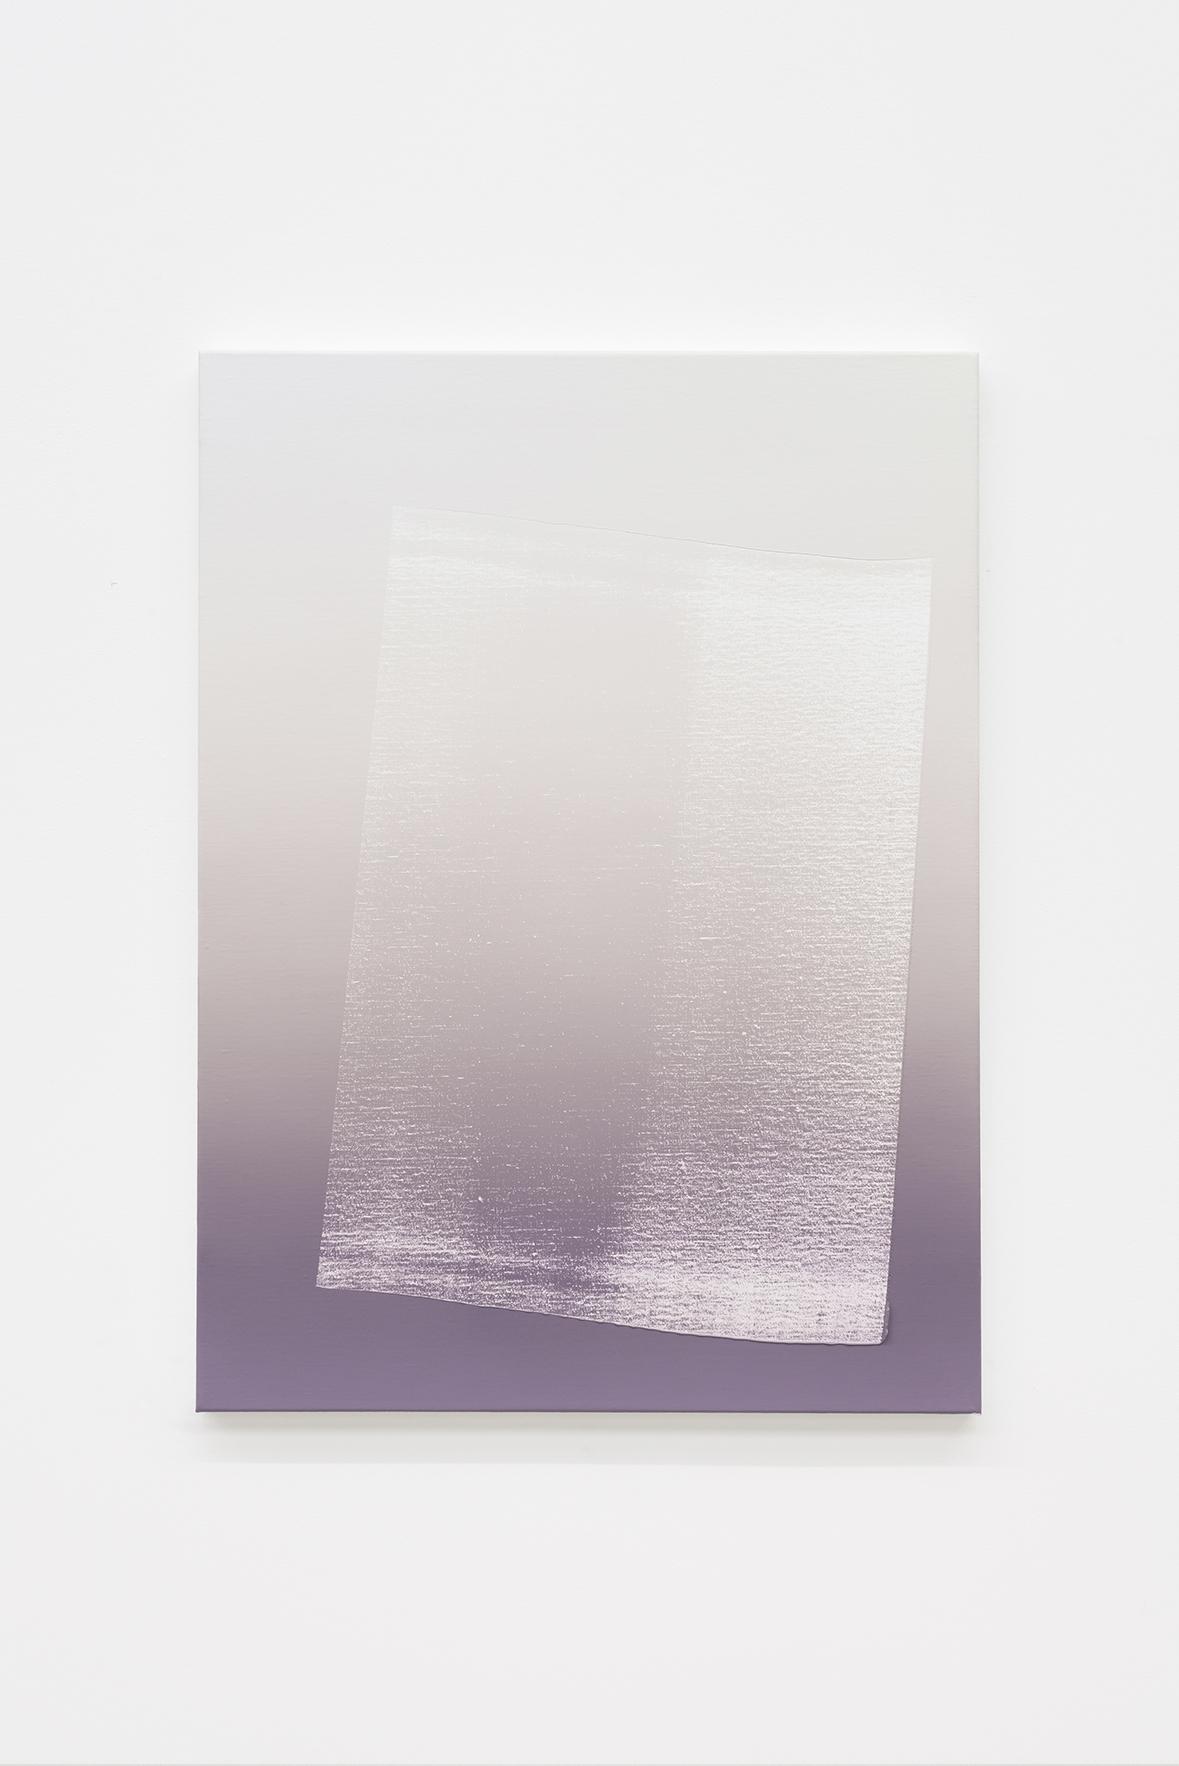 Untitled, 2017 |  | ProjecteSD